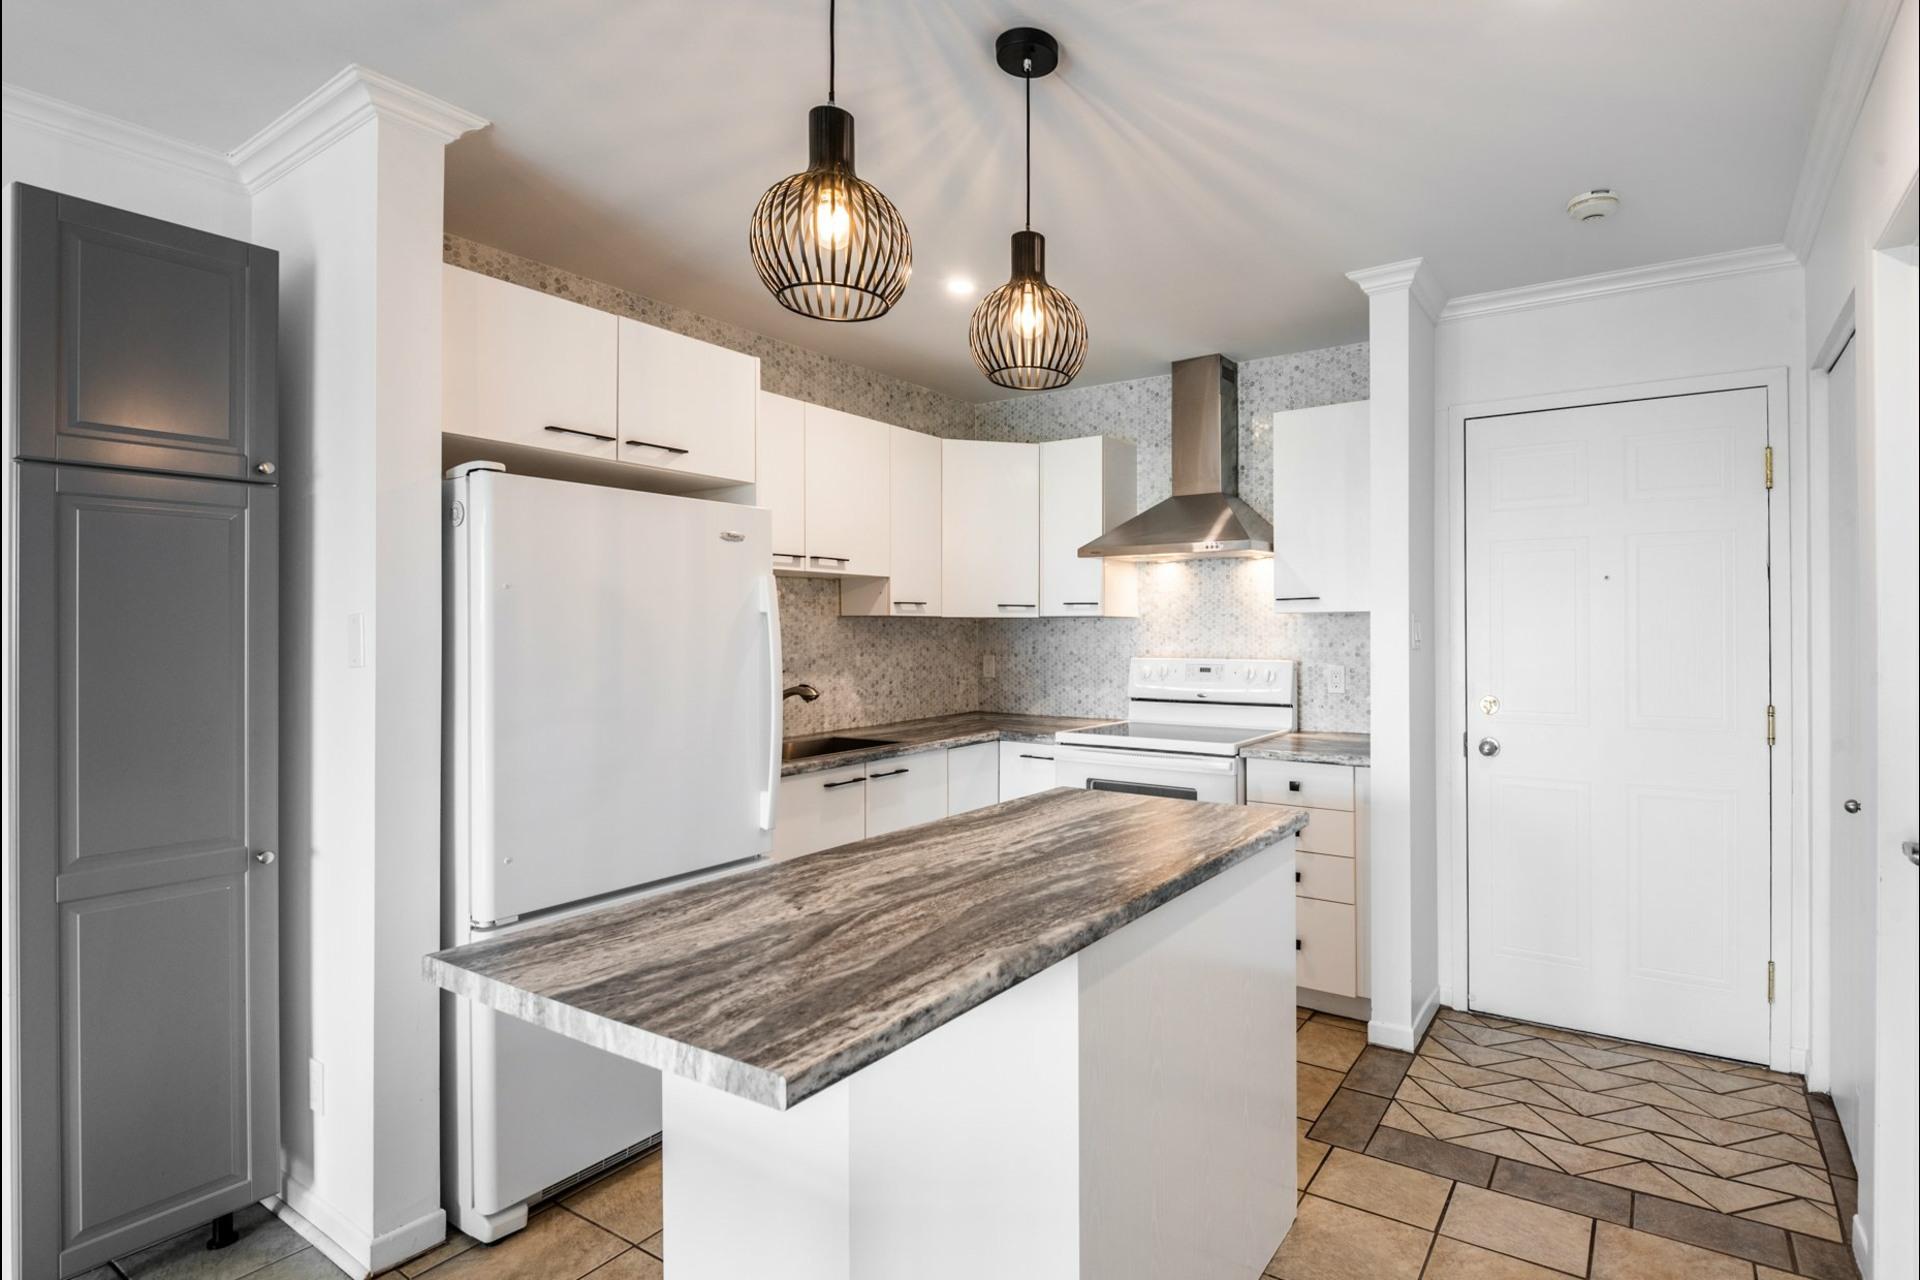 image 6 - Apartment For sale Saint-Hubert Longueuil  - 4 rooms